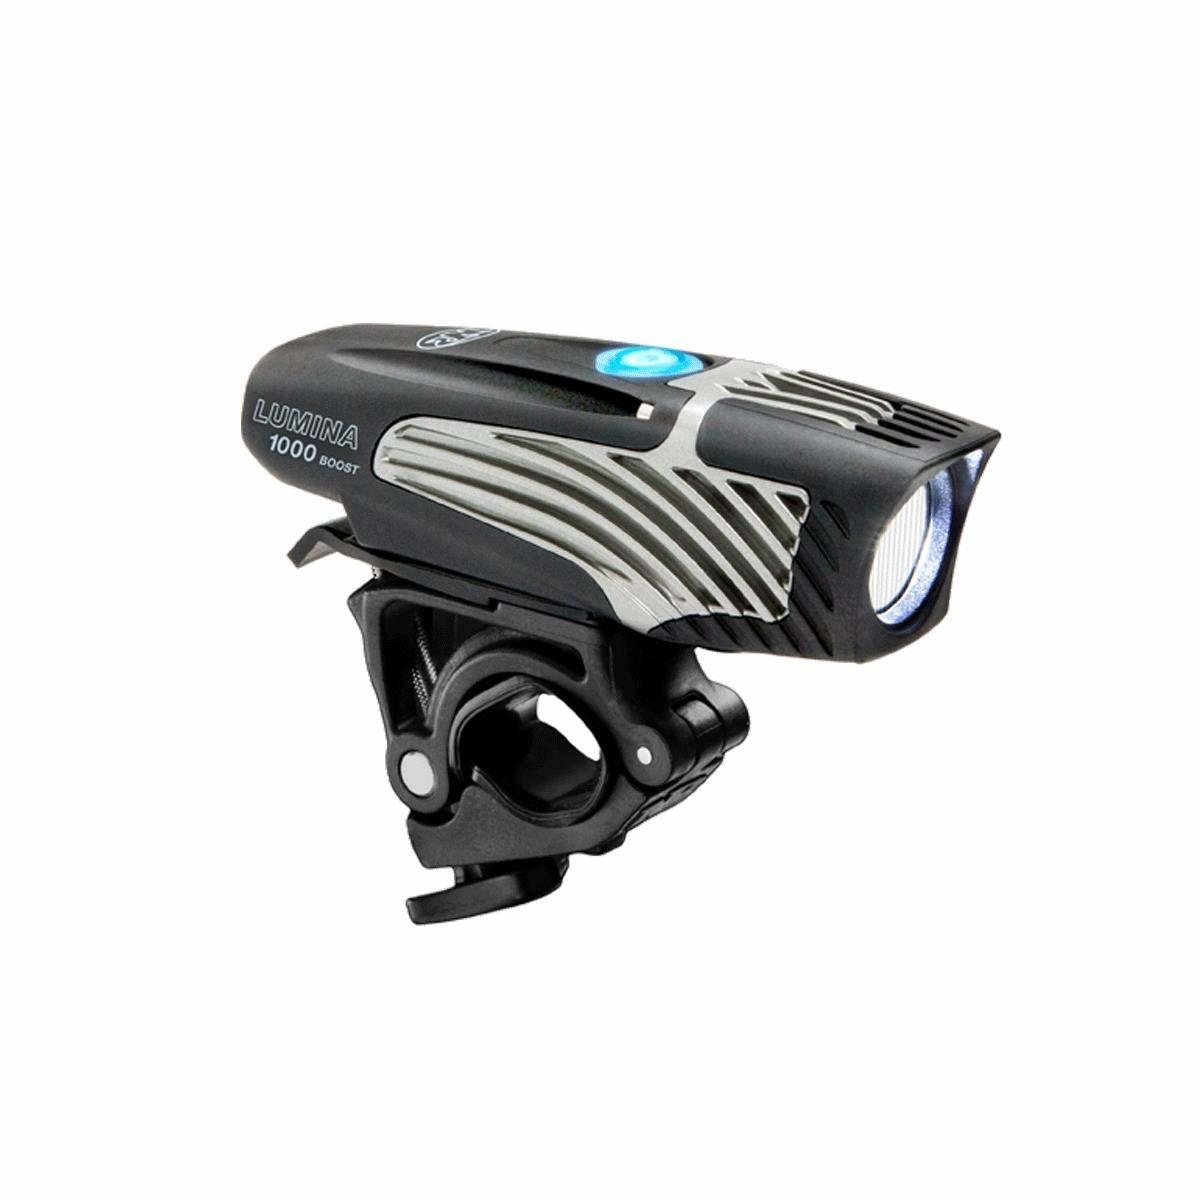 NiteRider NiteRider Rechargeable LED Light, Lumina 1000 Boost